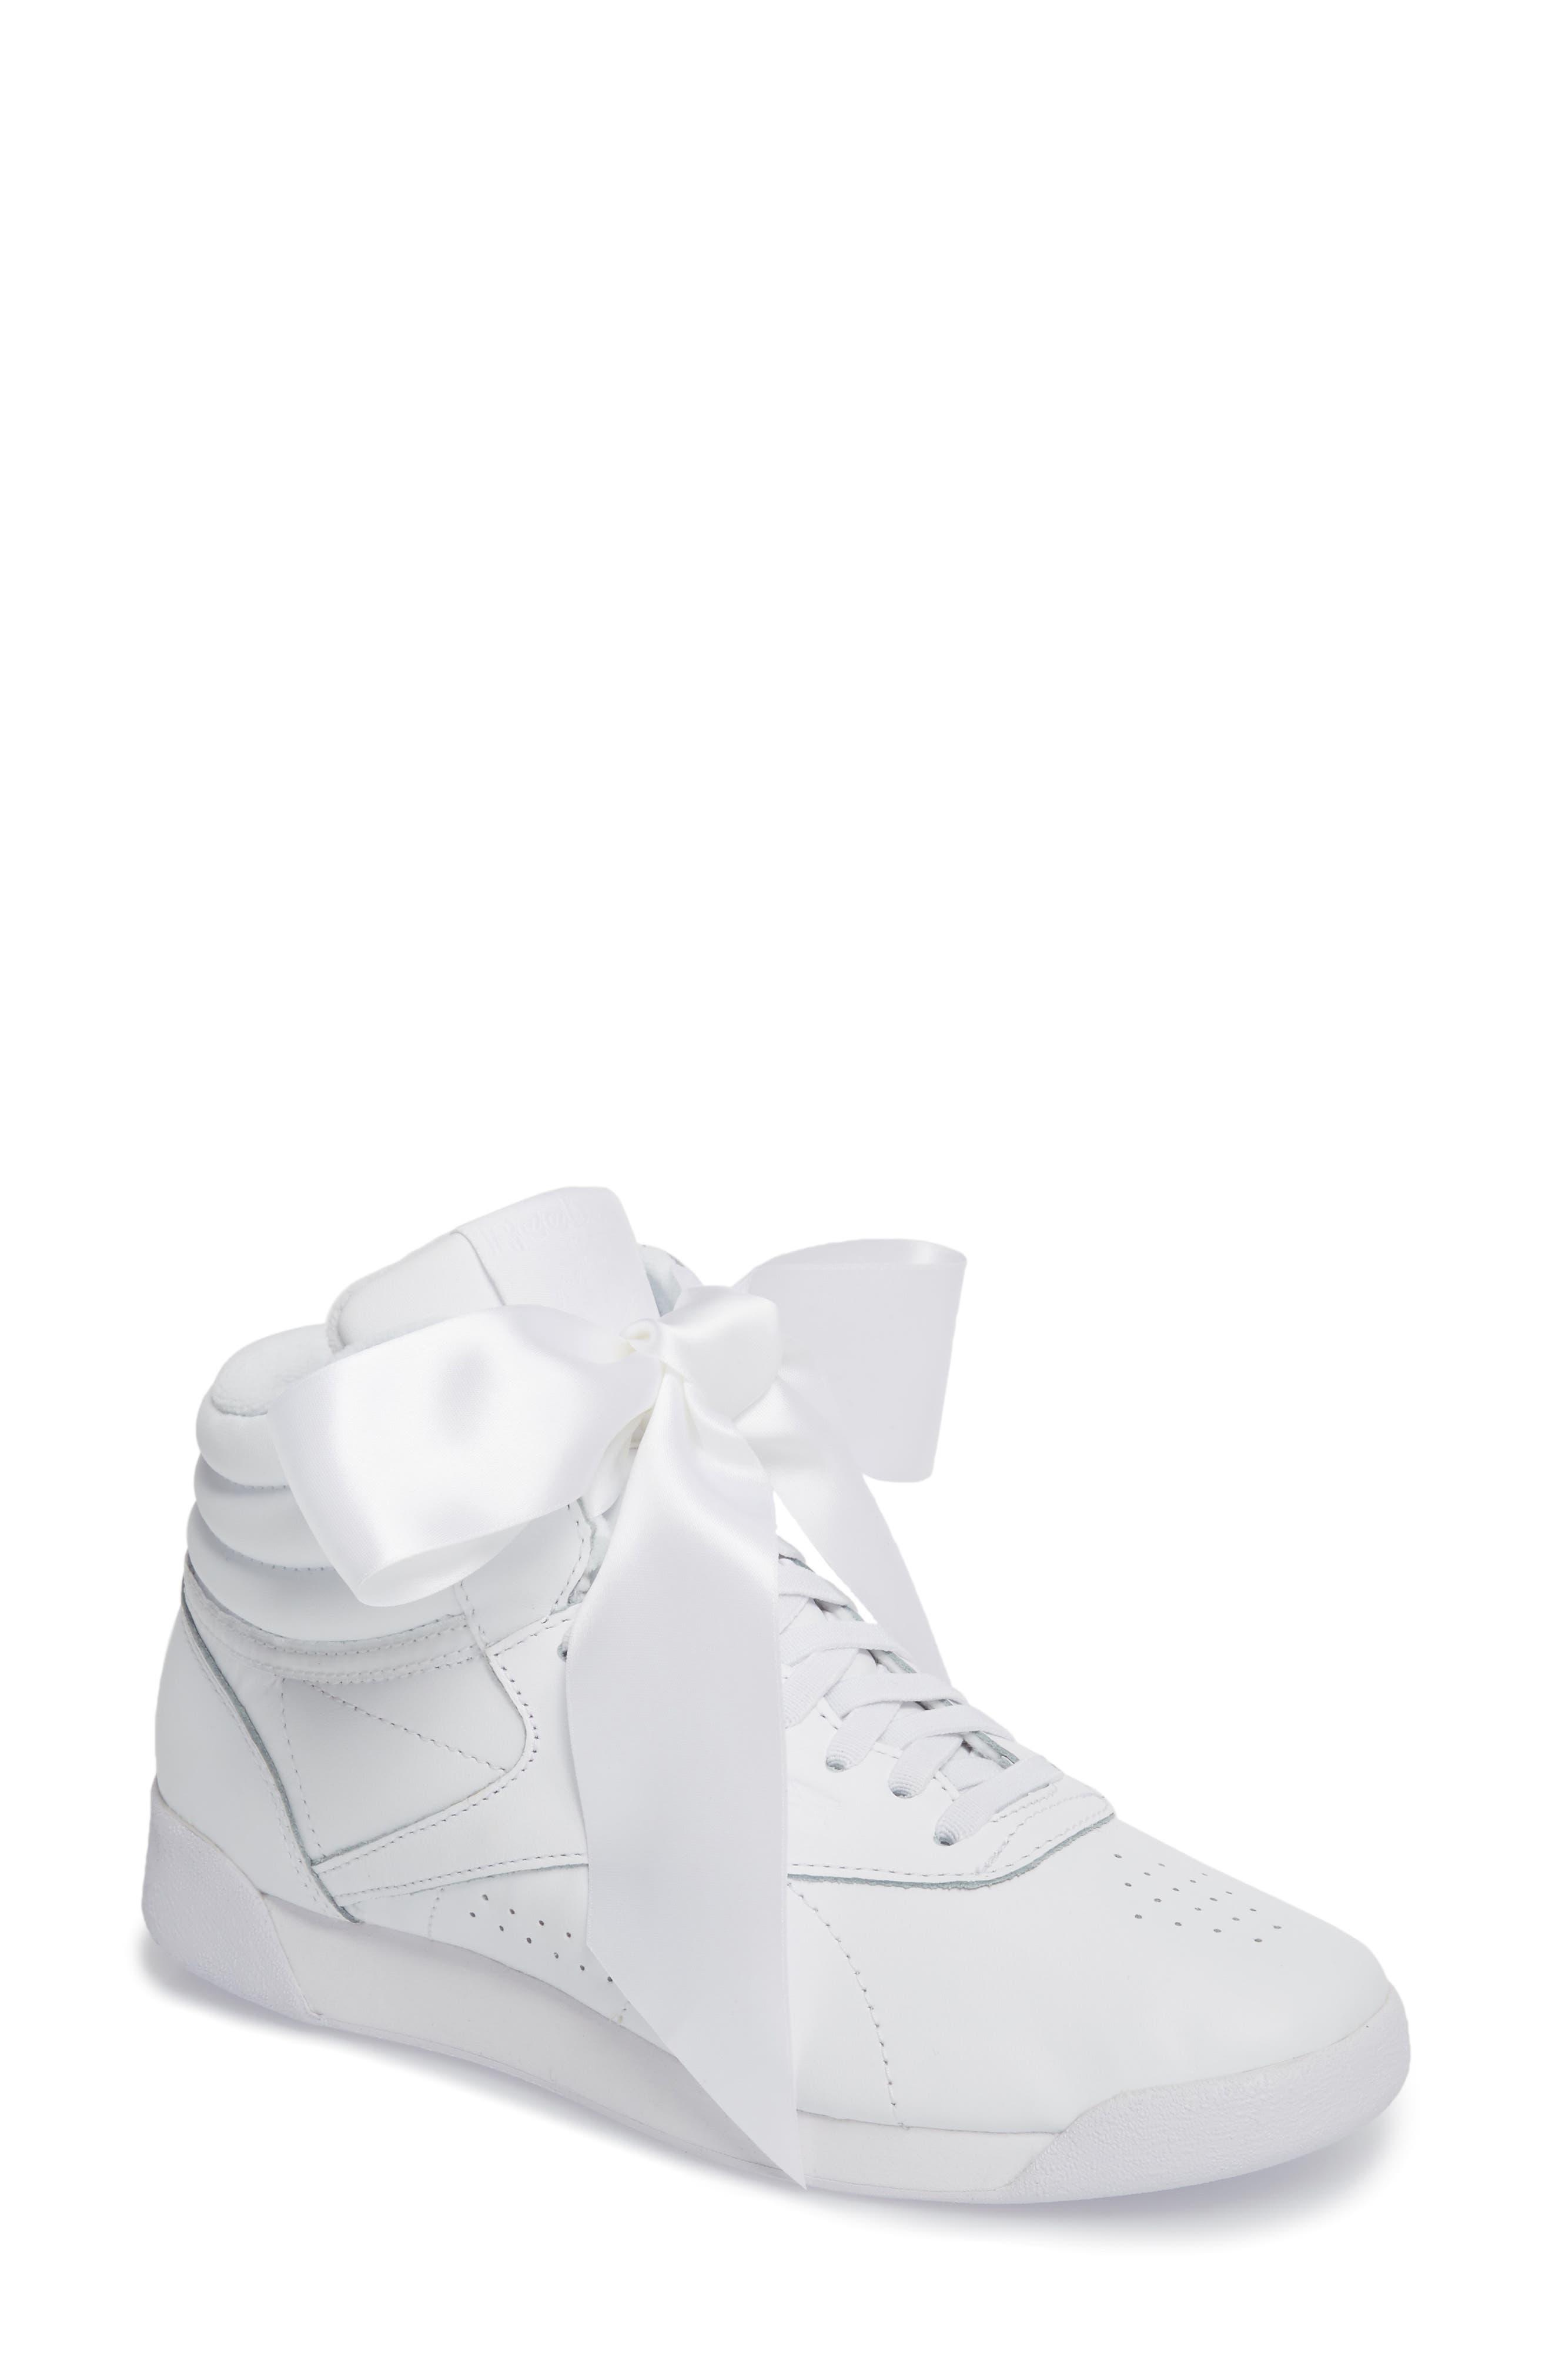 Freestyle Hi Satin Bow Sneaker,                         Main,                         color, White/ Skull Grey